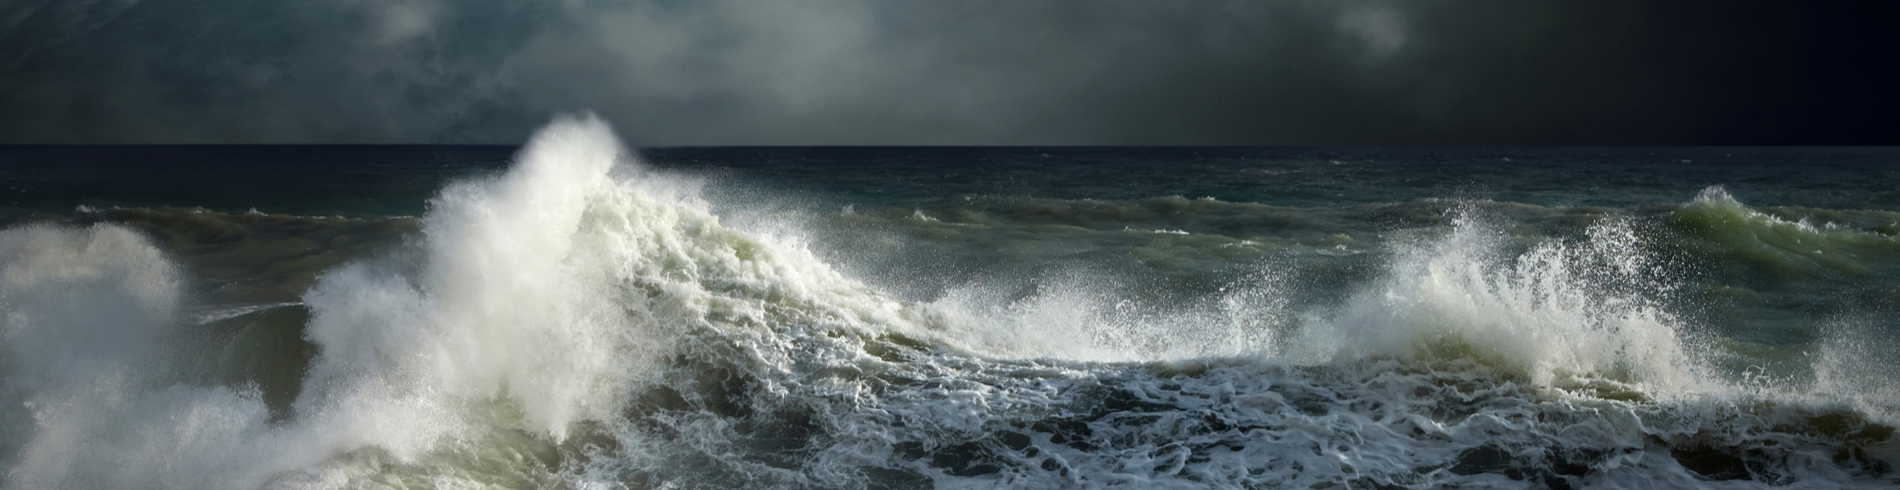 OCEAN TEXTILE cover image